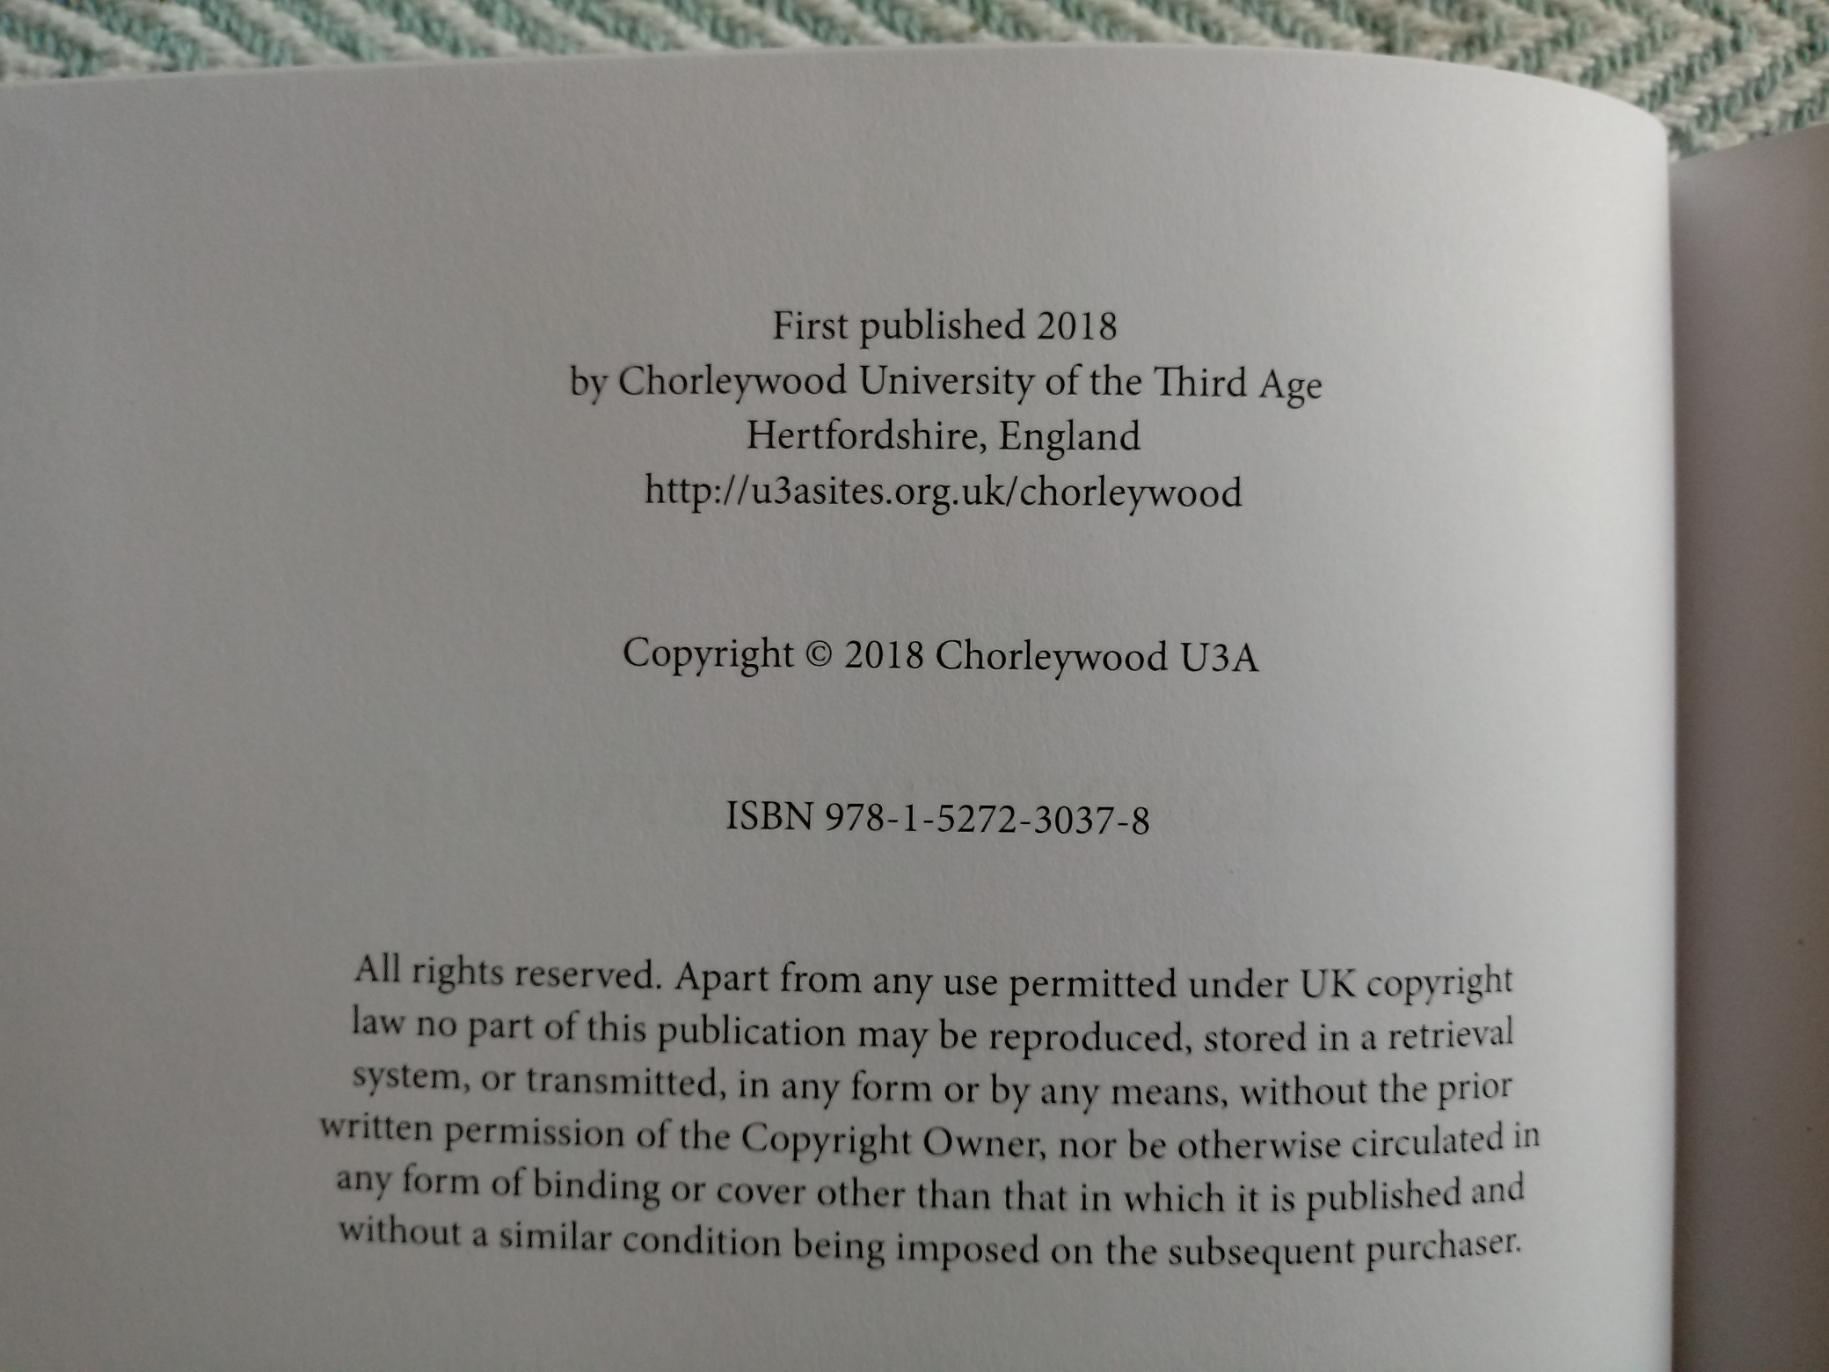 Exploring Chorleywood A Pictorial History by Members of Chorleywood U3A Sue Clark, David - Image 3 of 3